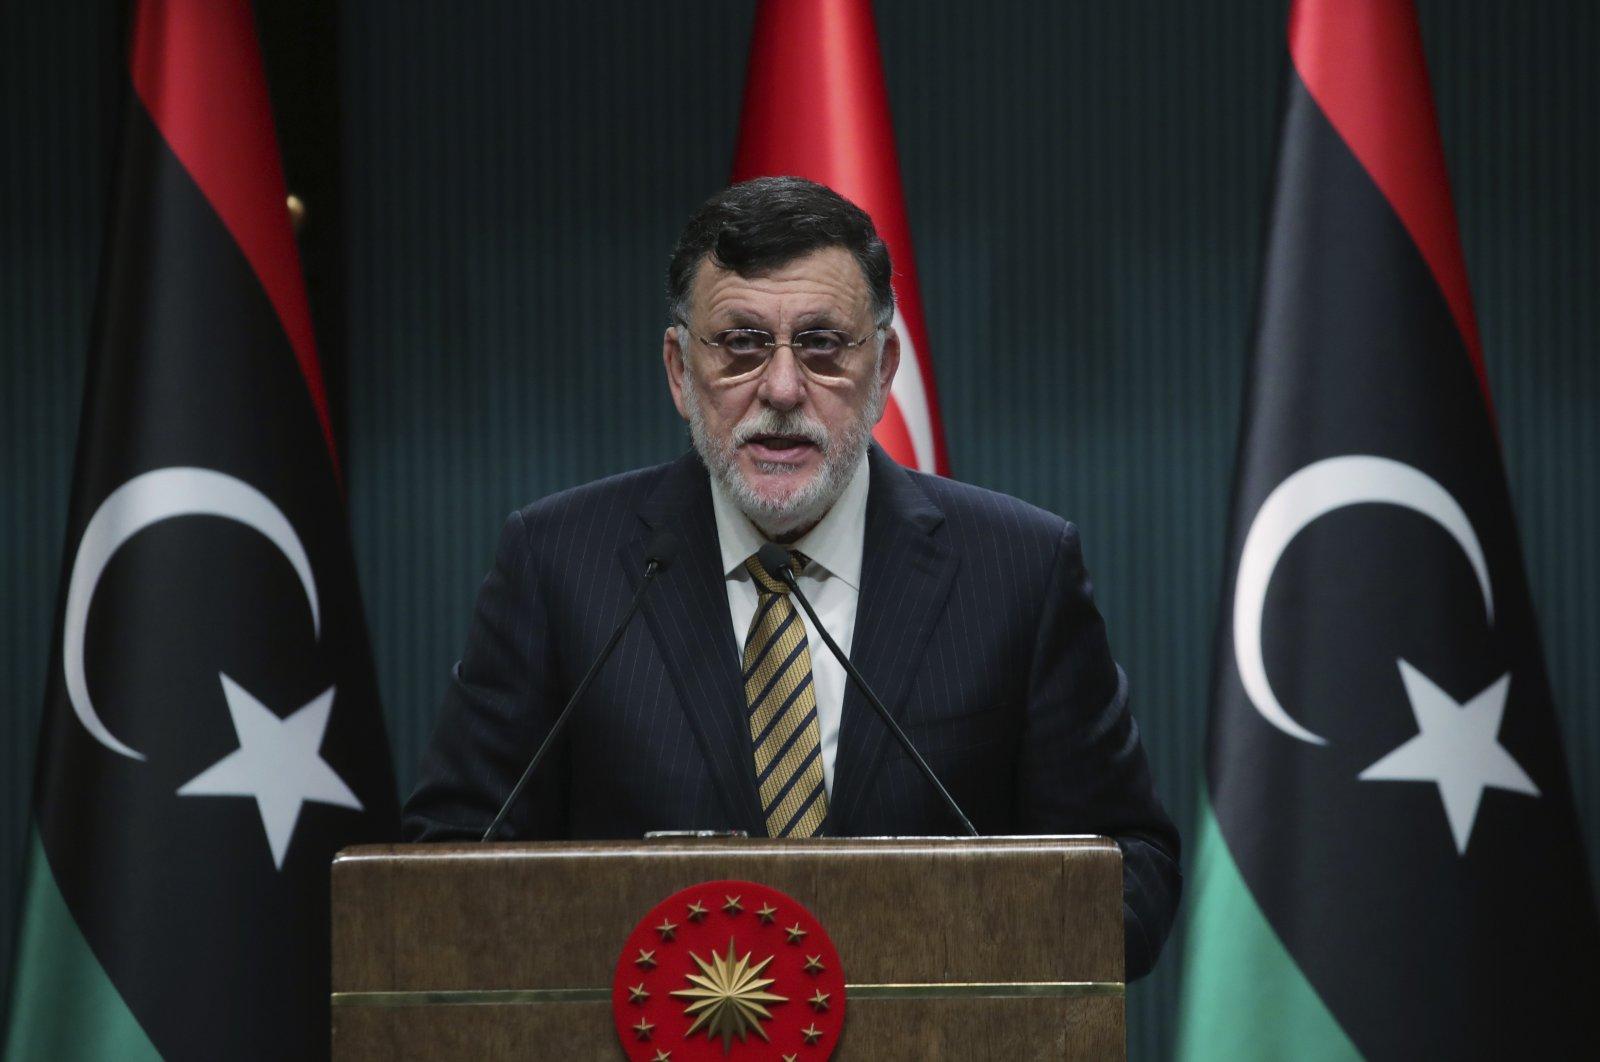 Fayez Sarraj, the head of Libya's internationally-recognized government, speaks at a joint news conference with Turkey's President Recep Tayyip Erdoğan, in Ankara, Turkey, June 4, 2020. (Turkish Presidency via AP)